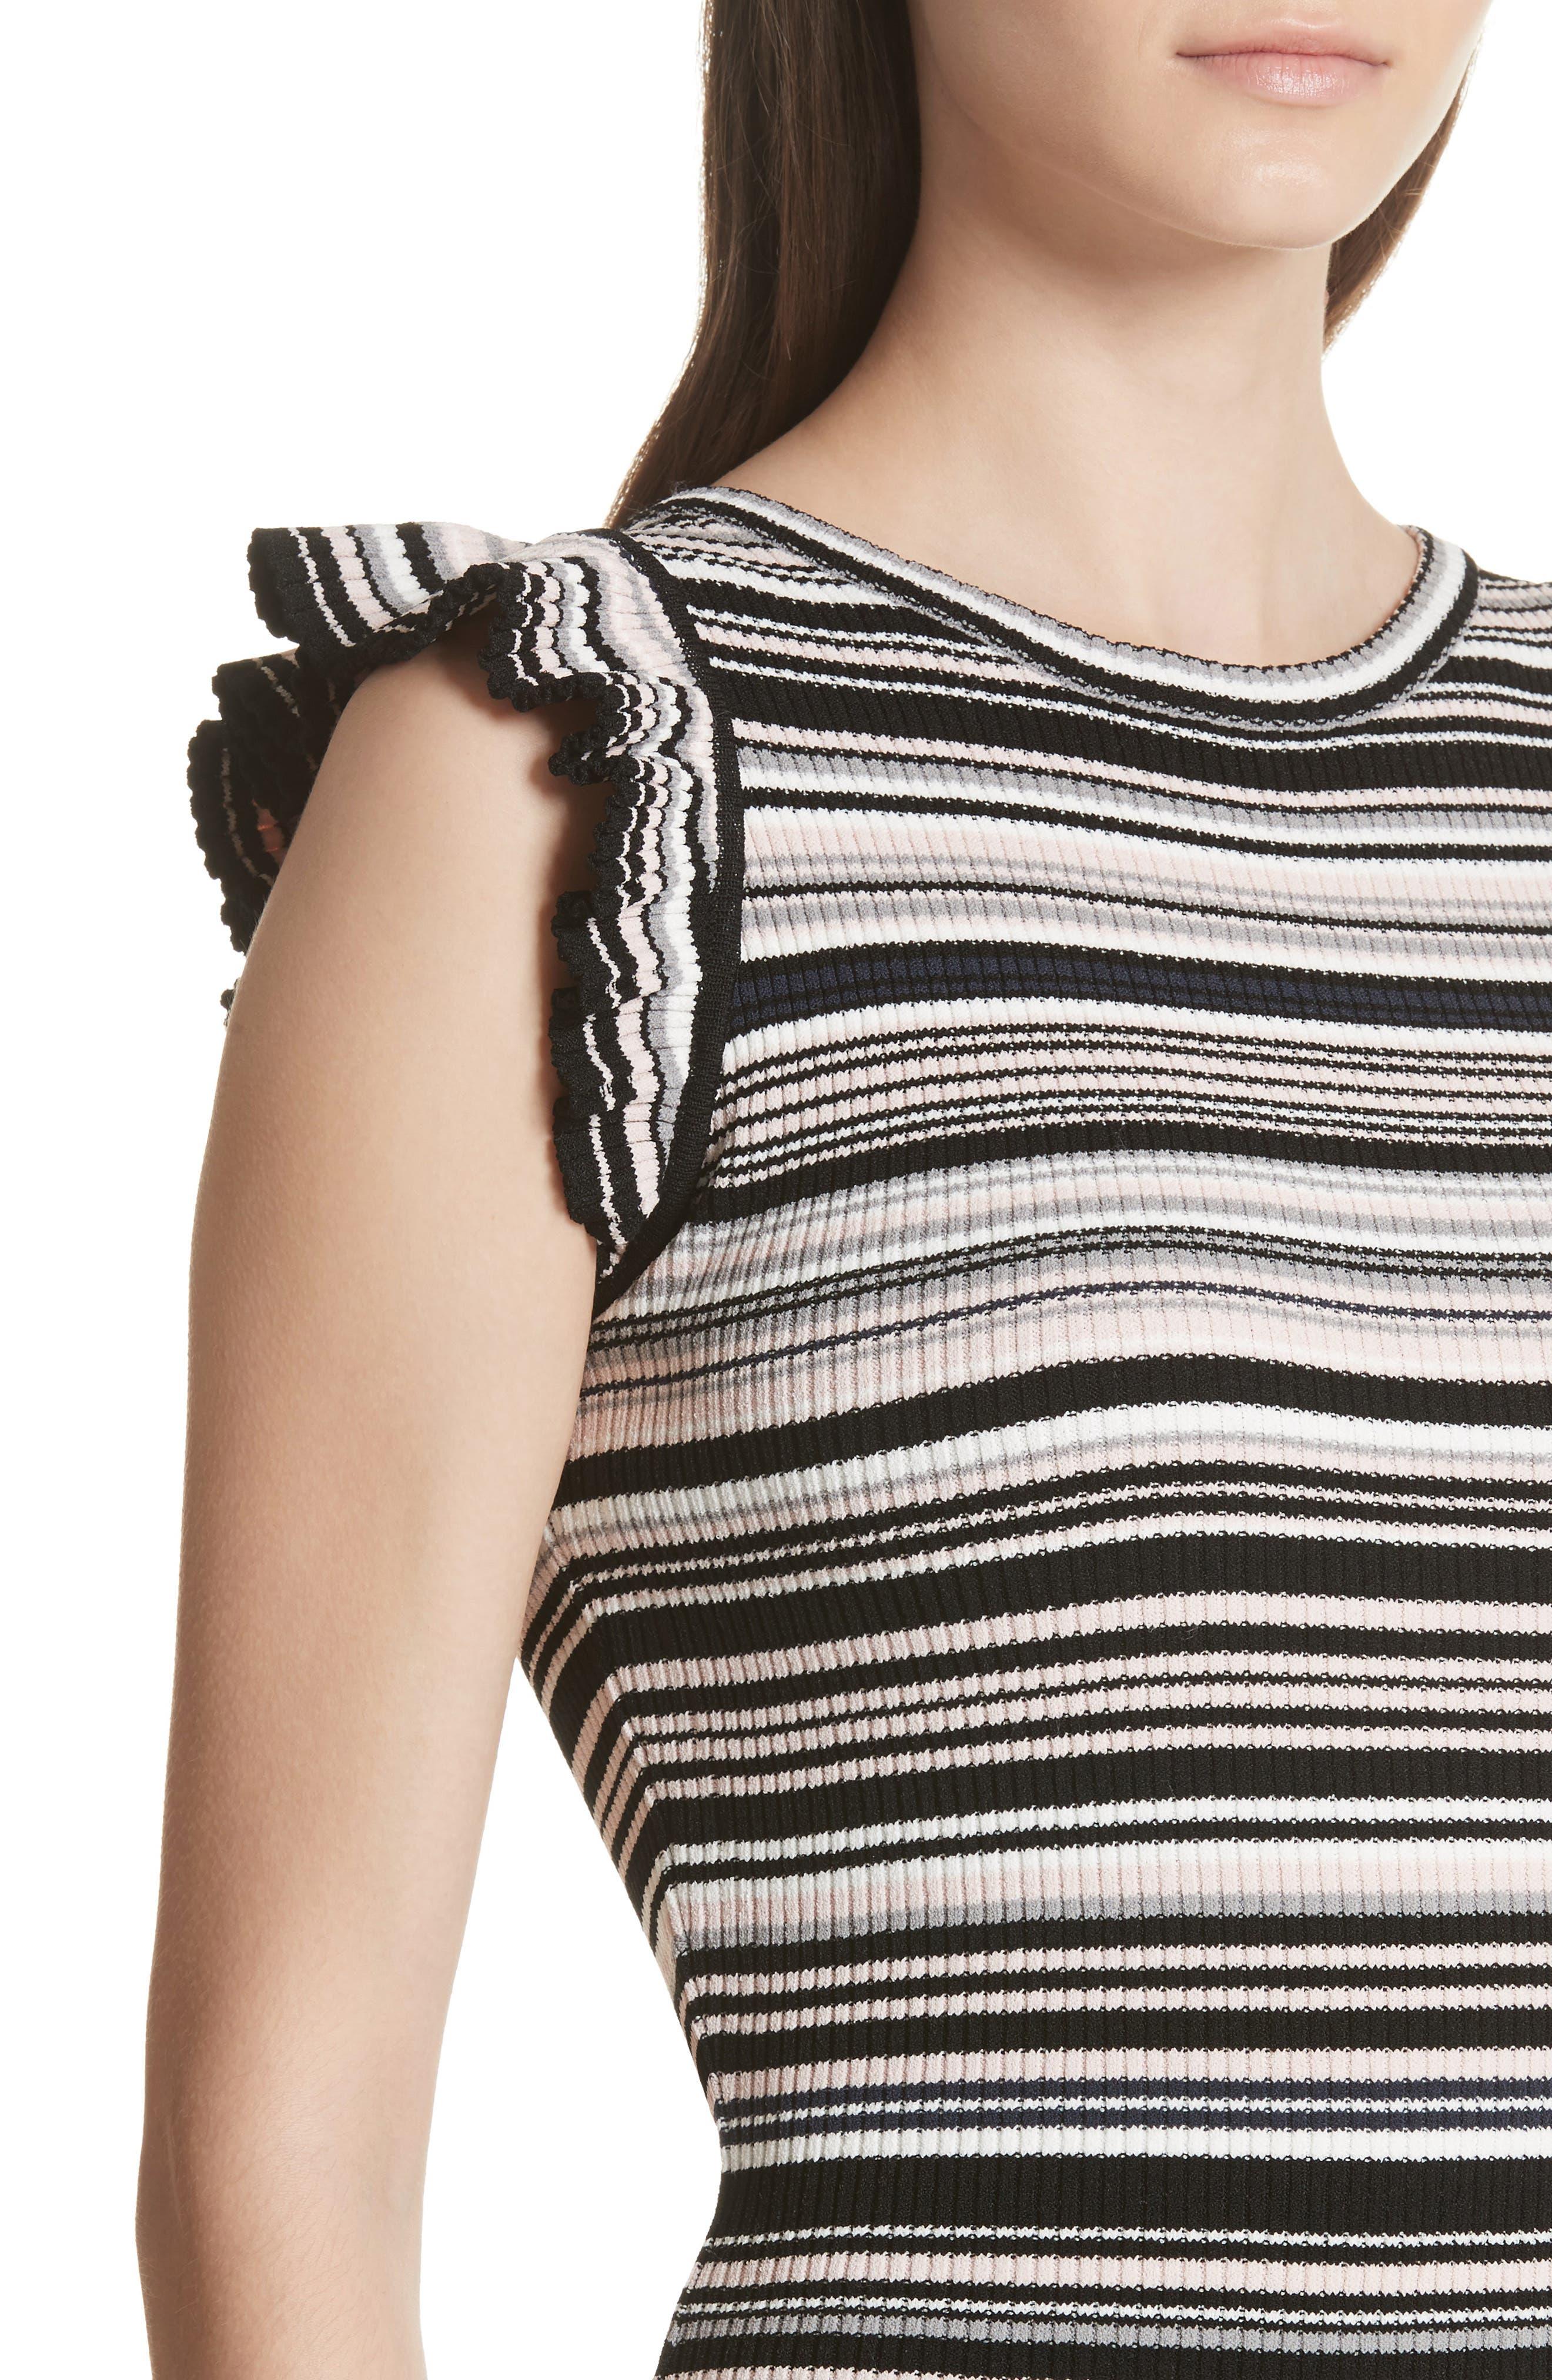 Microstripe Knit Mermaid Dress,                             Alternate thumbnail 4, color,                             Neutral Multi